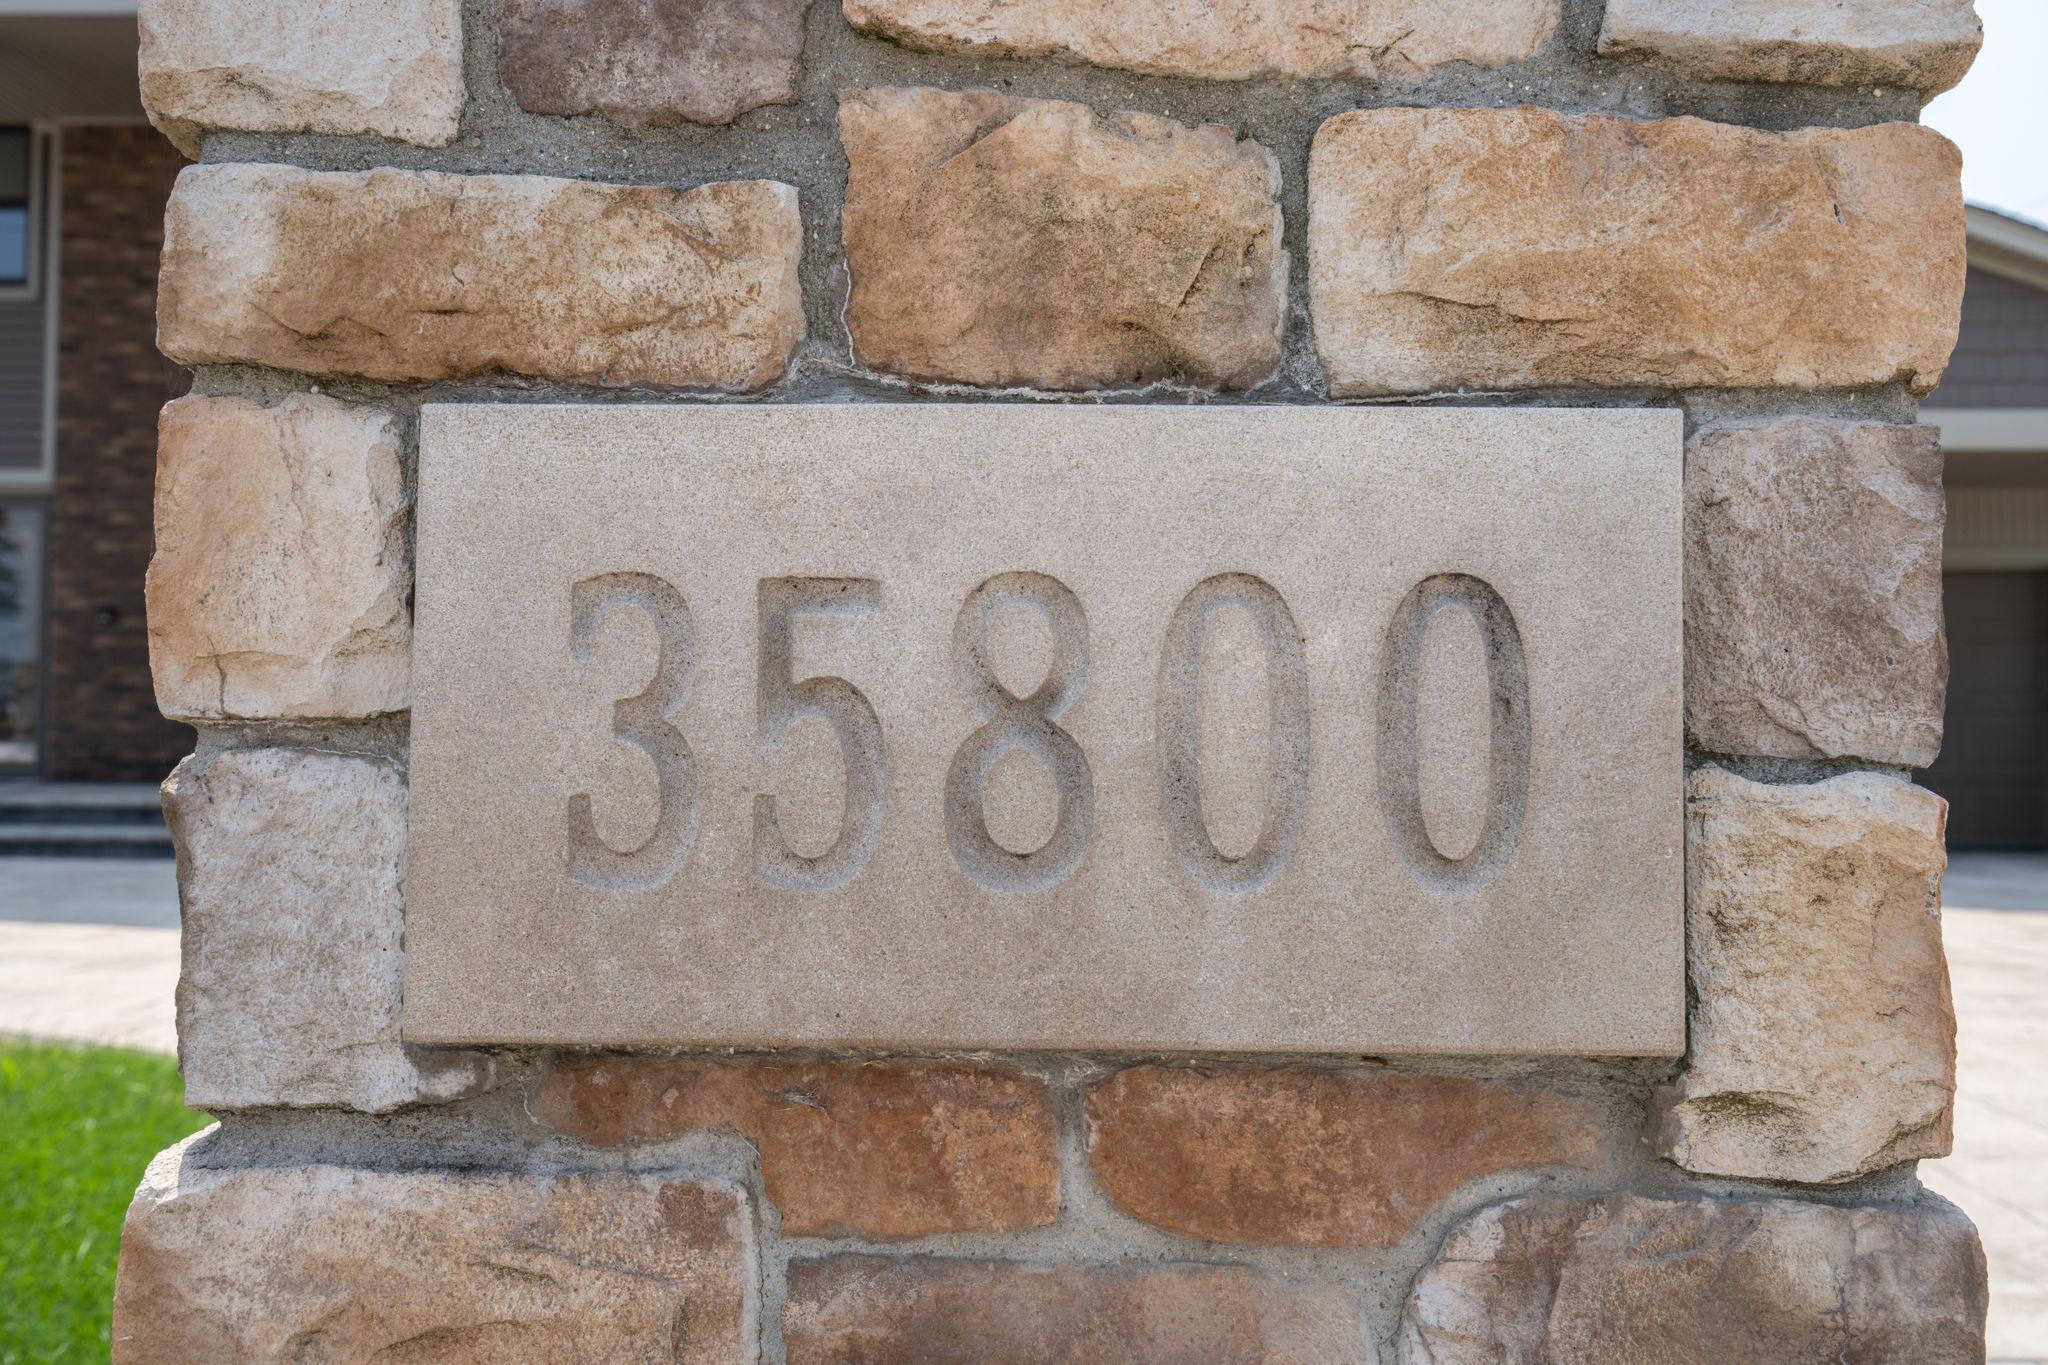 35800 Koenig St, New Baltimore, MI 48047, USA Photo 53